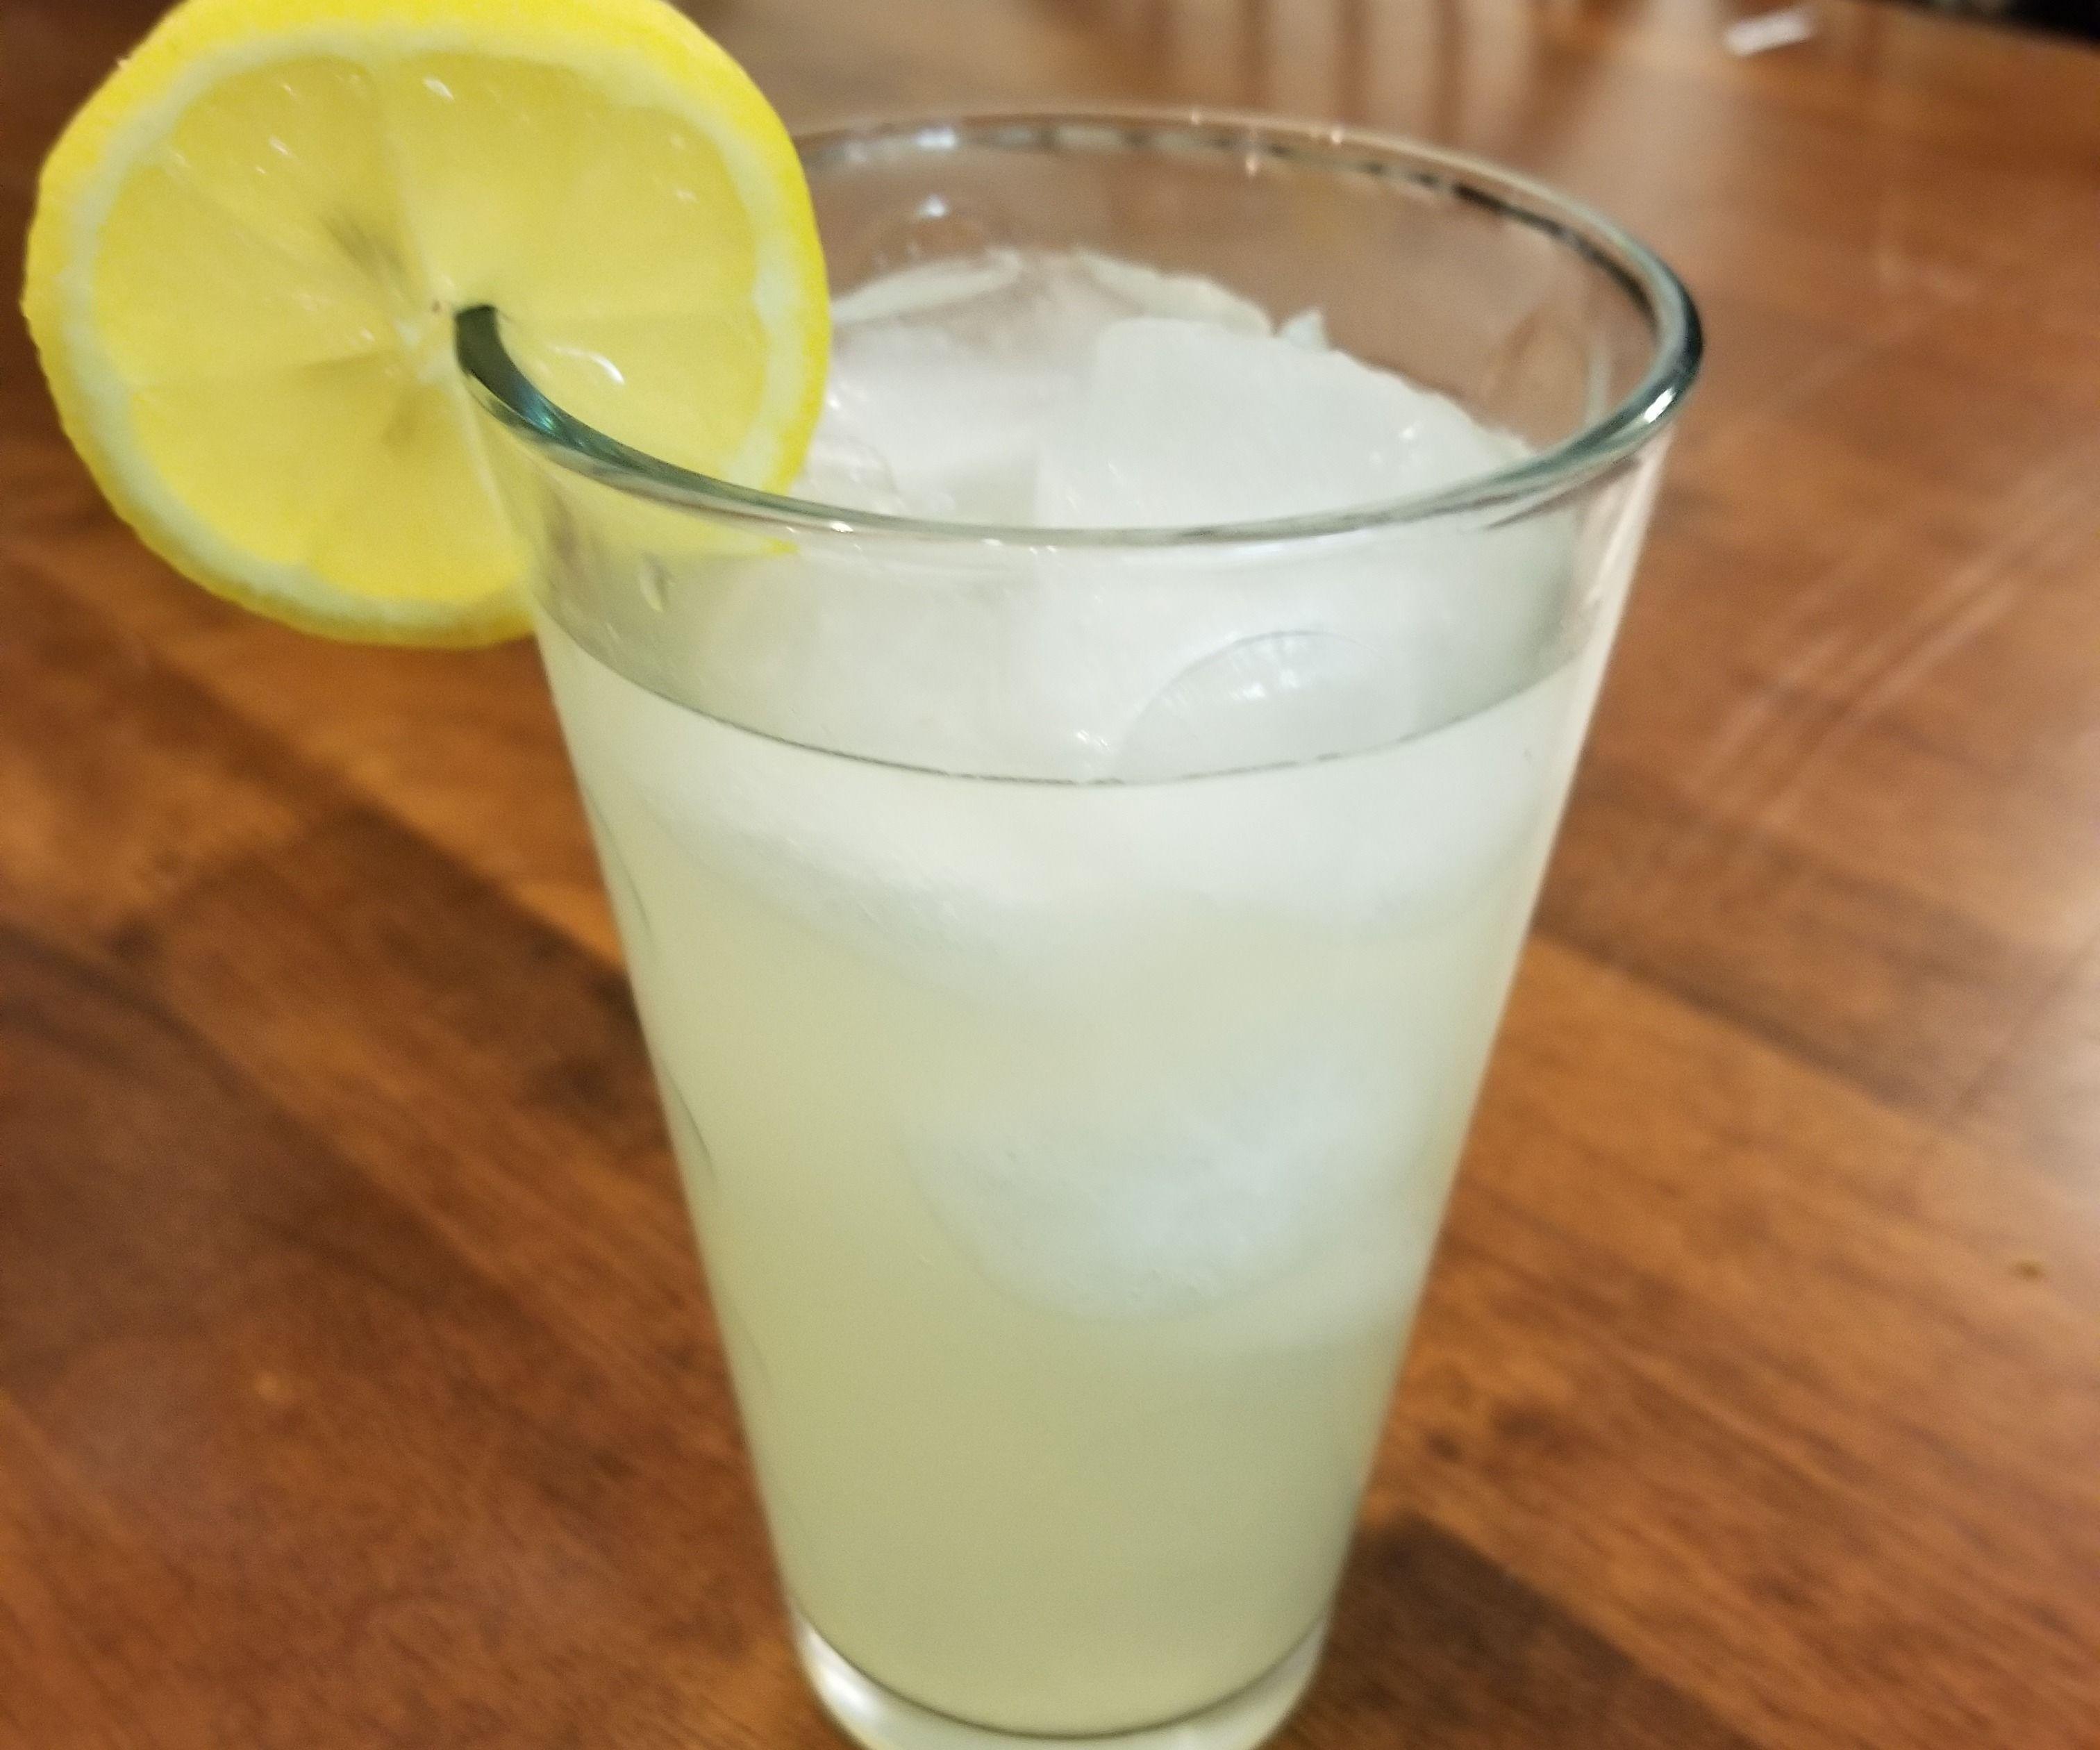 How to Make Sugar-Free Lemonade